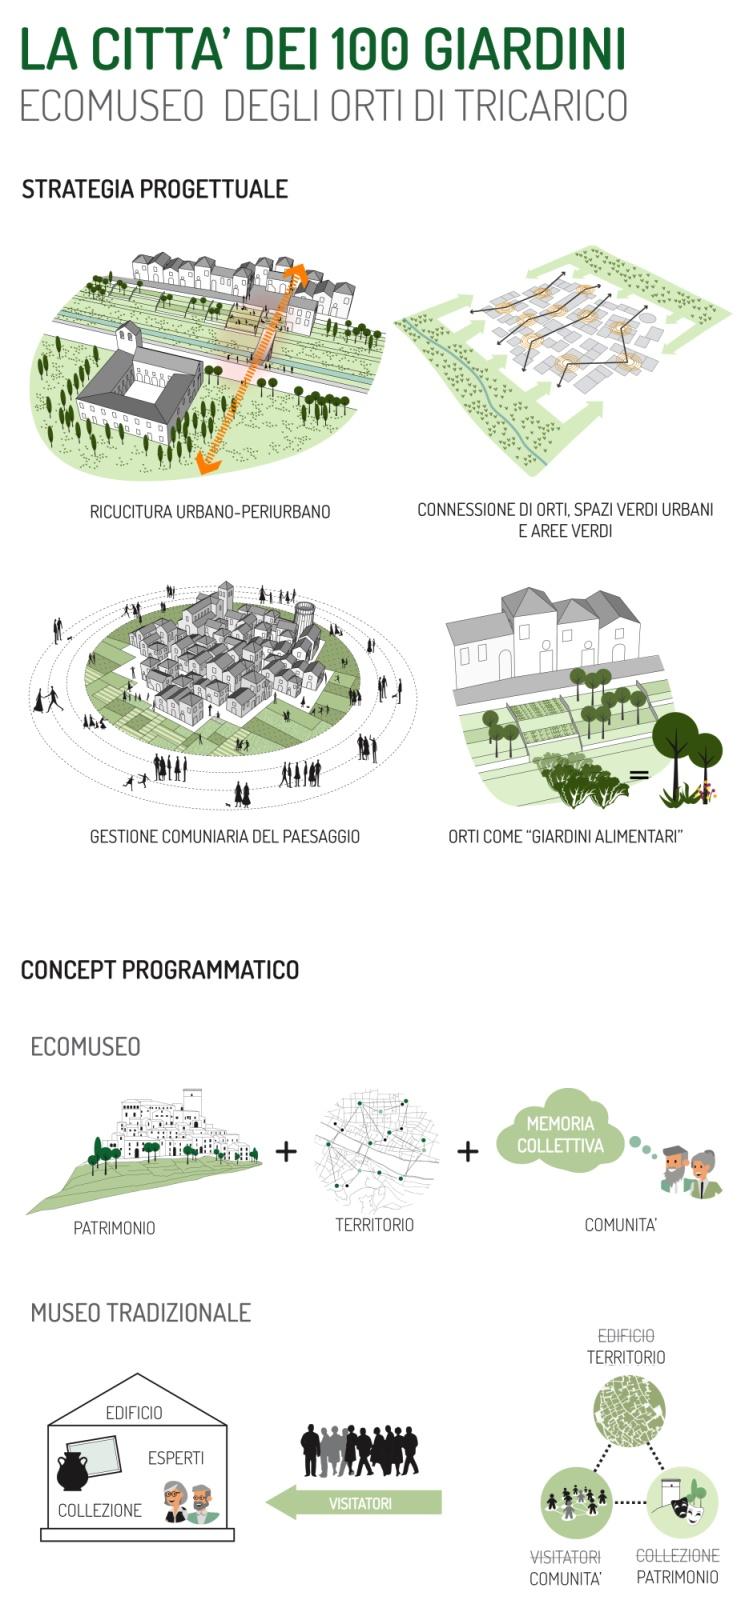 The city of 100 gardens